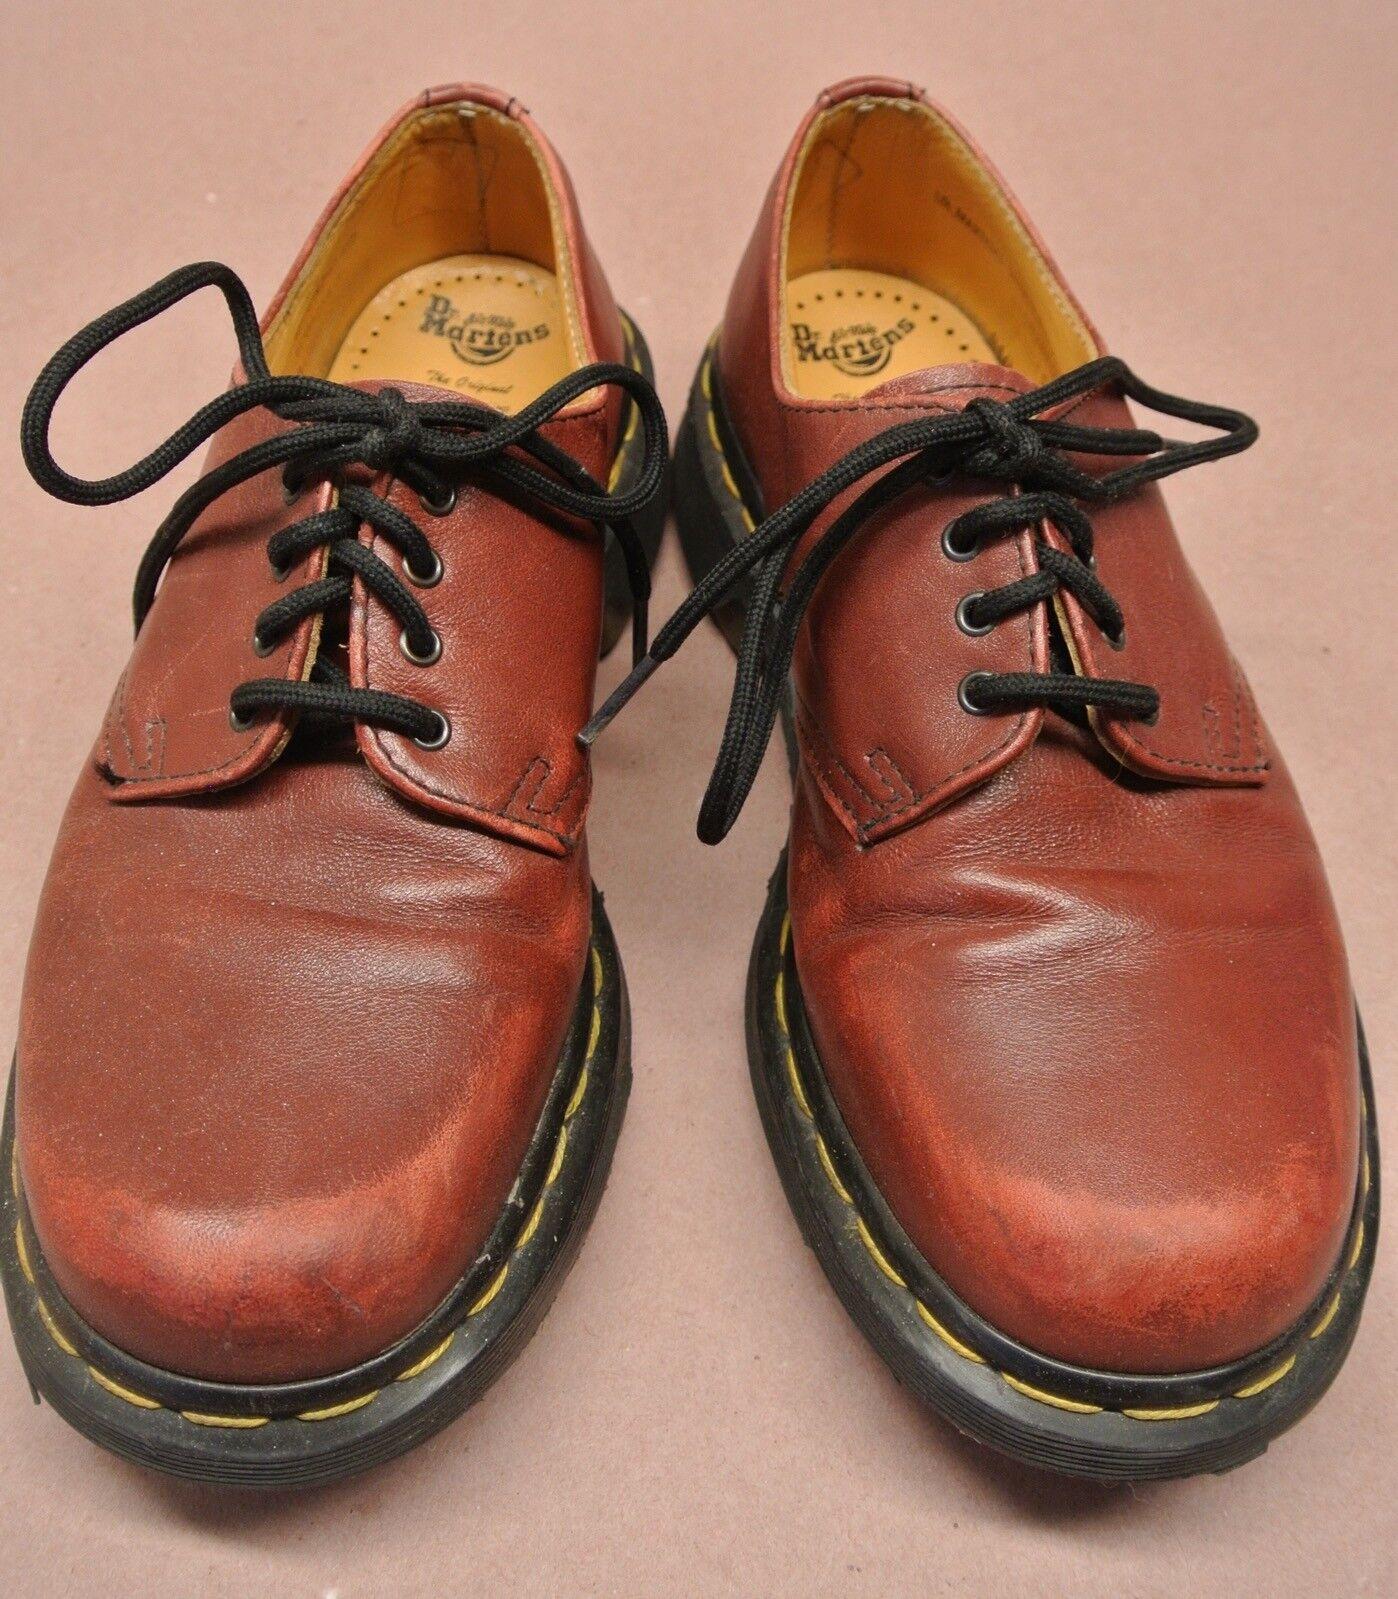 Women's Dr. Martens Oxford shoes Reddish Brown Size 5 UK (7 US)